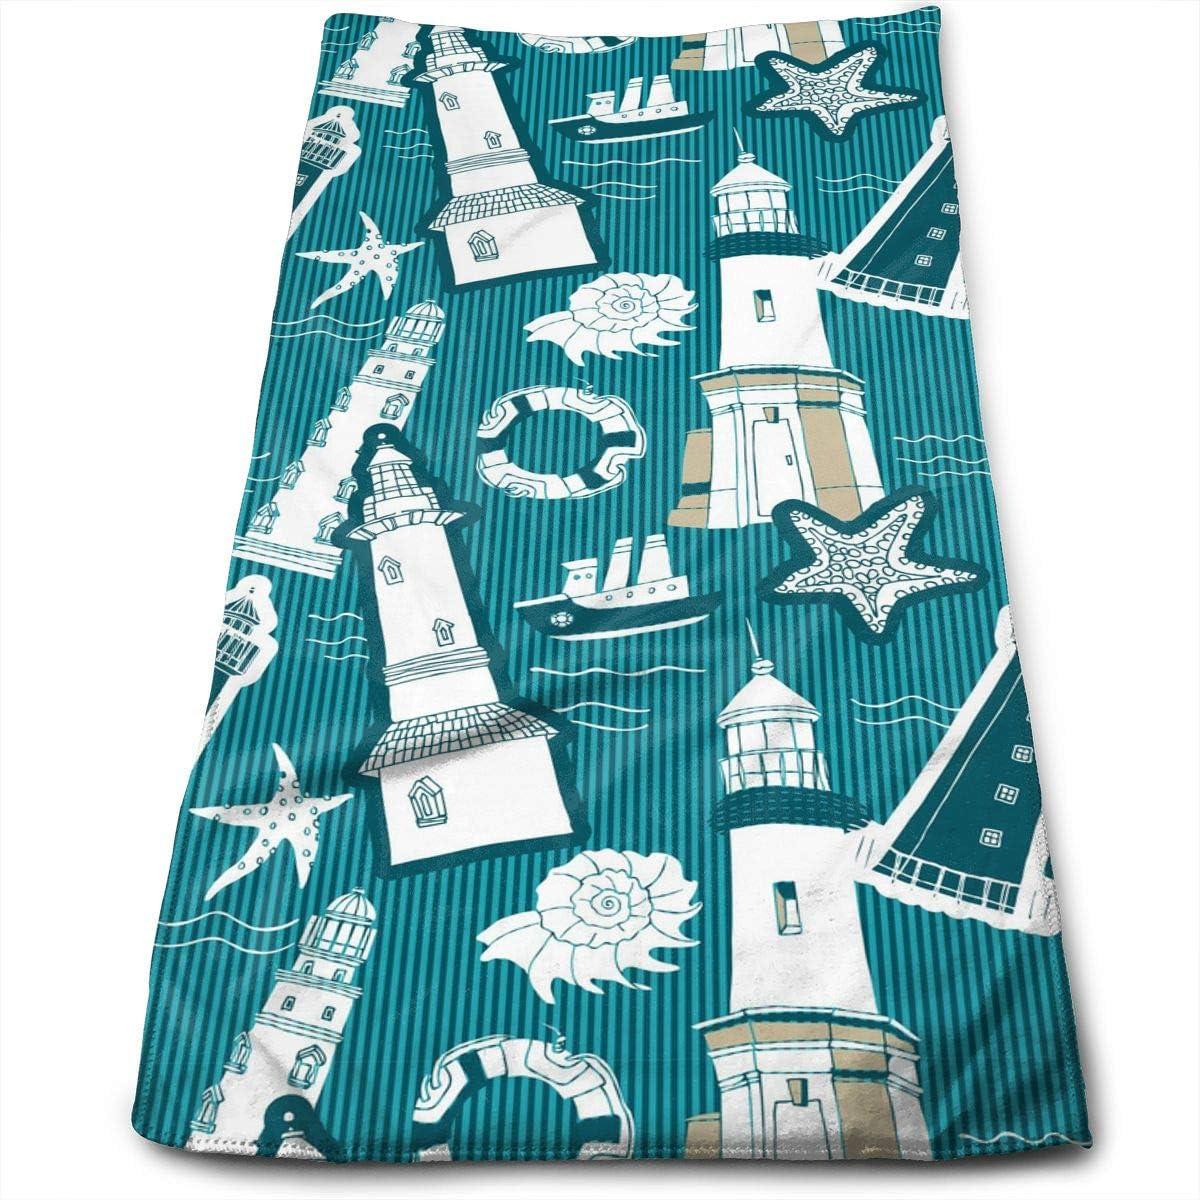 Nautical Lighthouse Life Ring Hand Towels Bathroom Soft Blue Ocean Starfish Seashell Bath Towel Absorbent Kitchen Dish Towel Home Decor 27.5'' X 12''